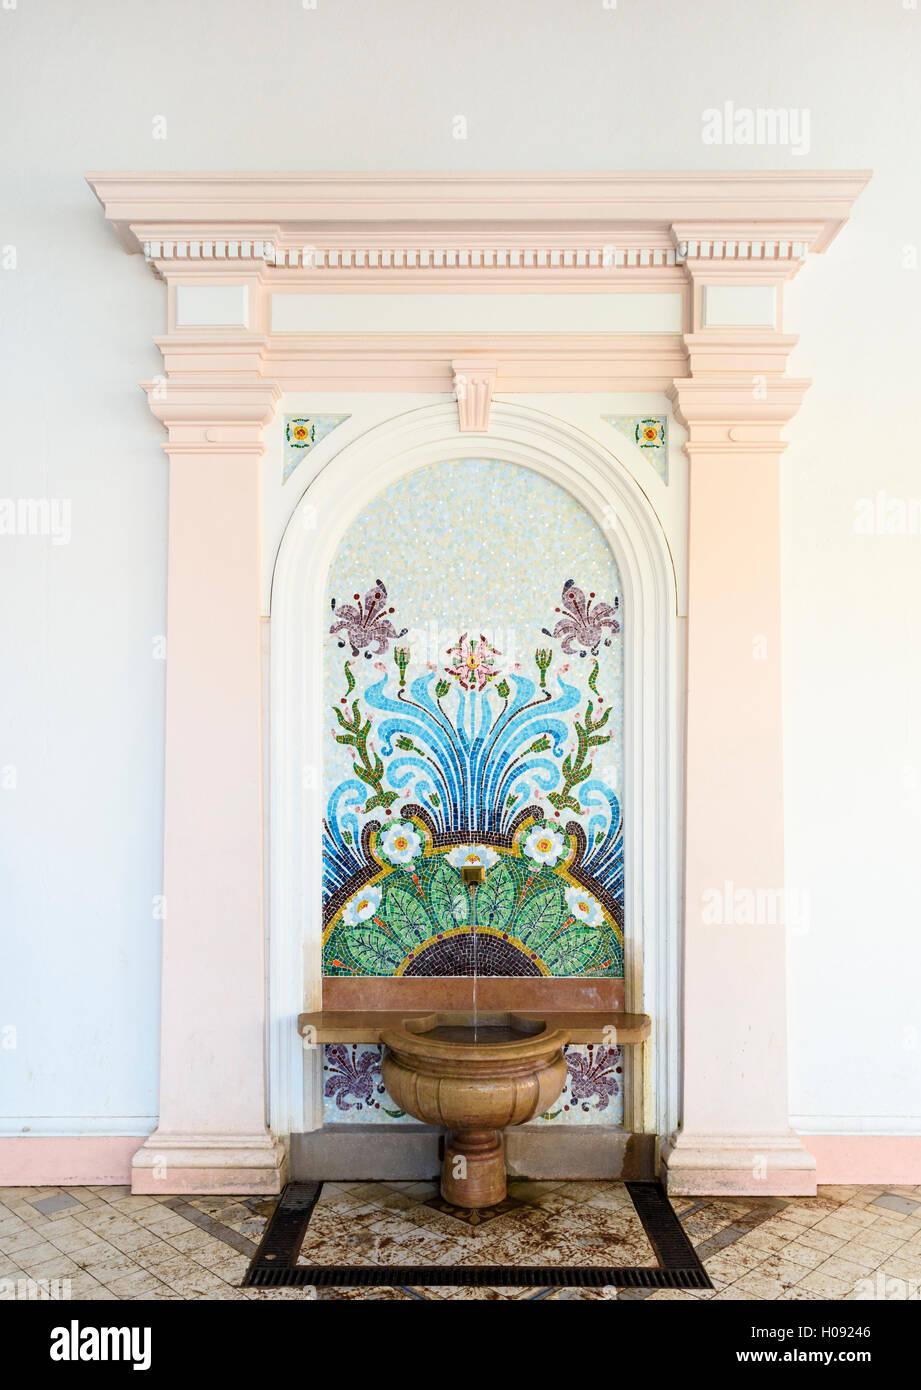 The original source of Évian spring water, the Cachet spring, Évian-les-Bains France - Stock Image